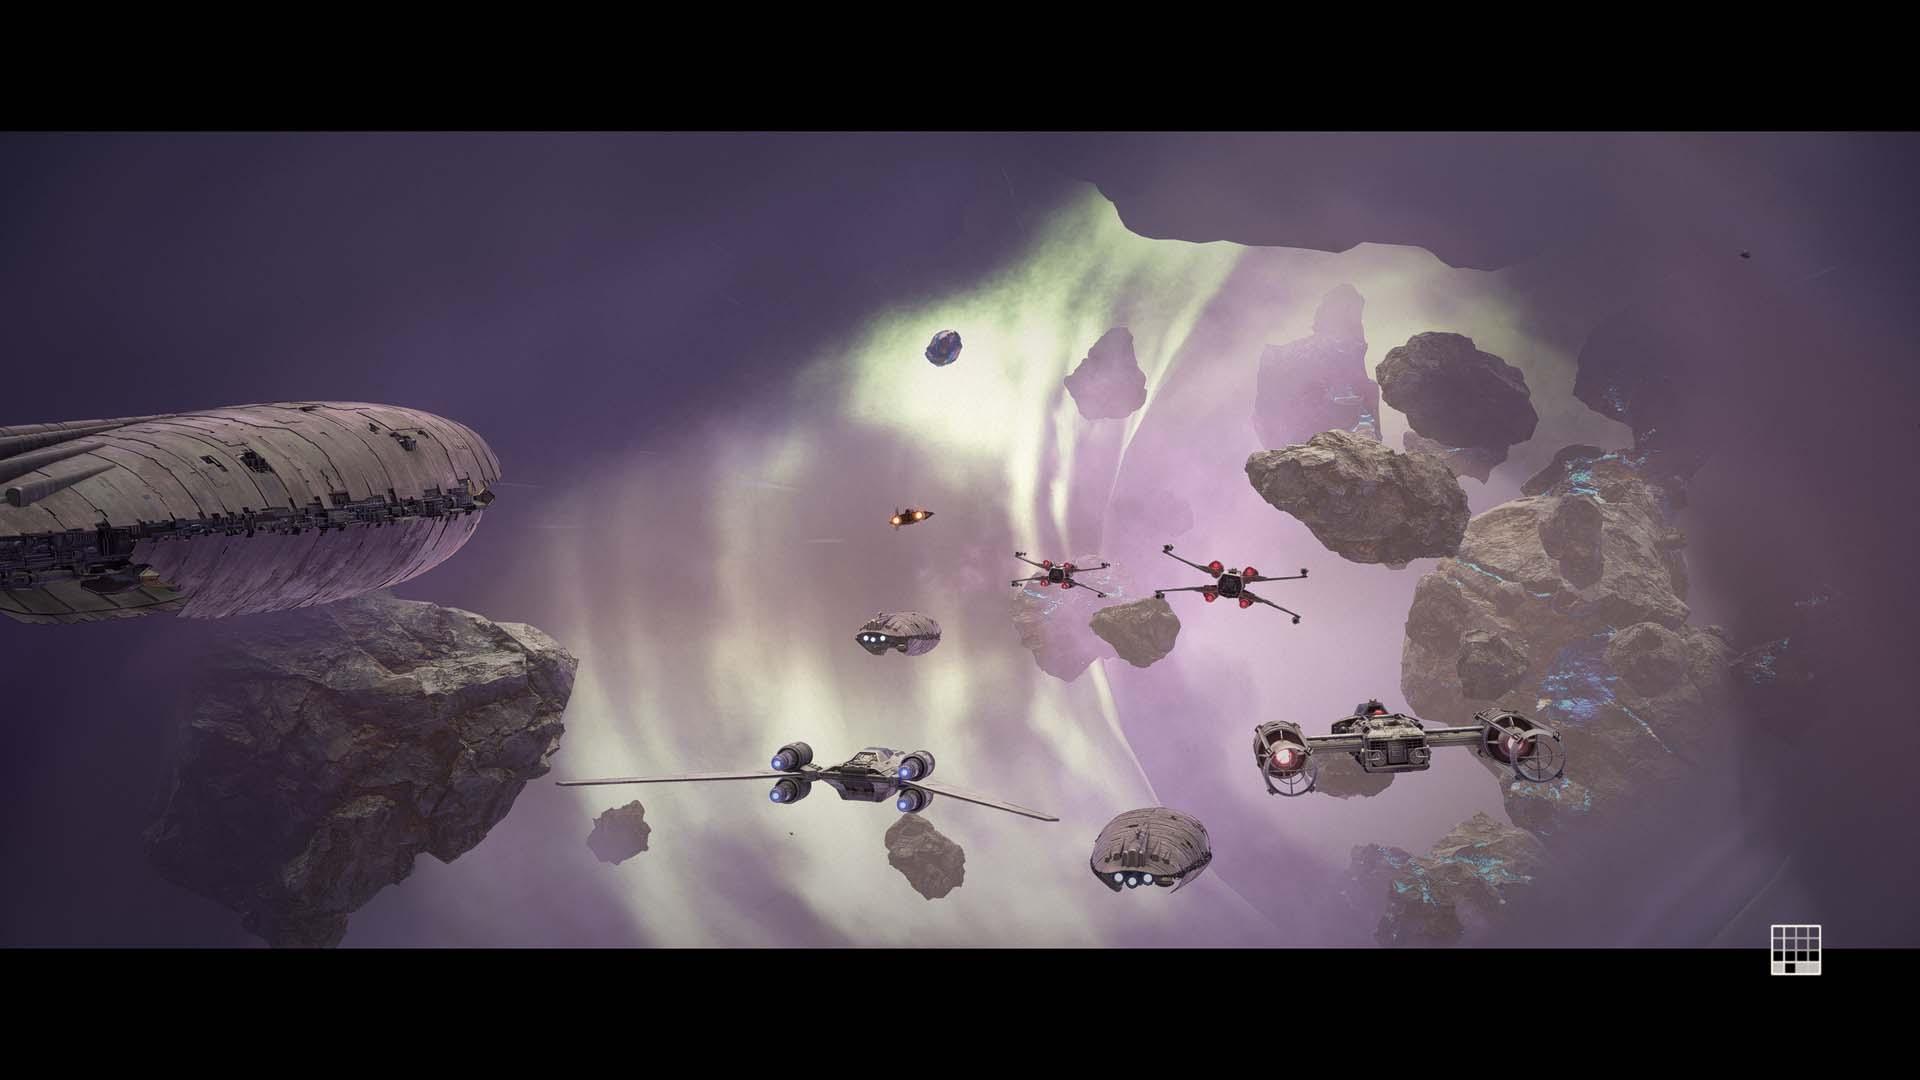 Star-Wars-Squadrons-Gameblog -30-